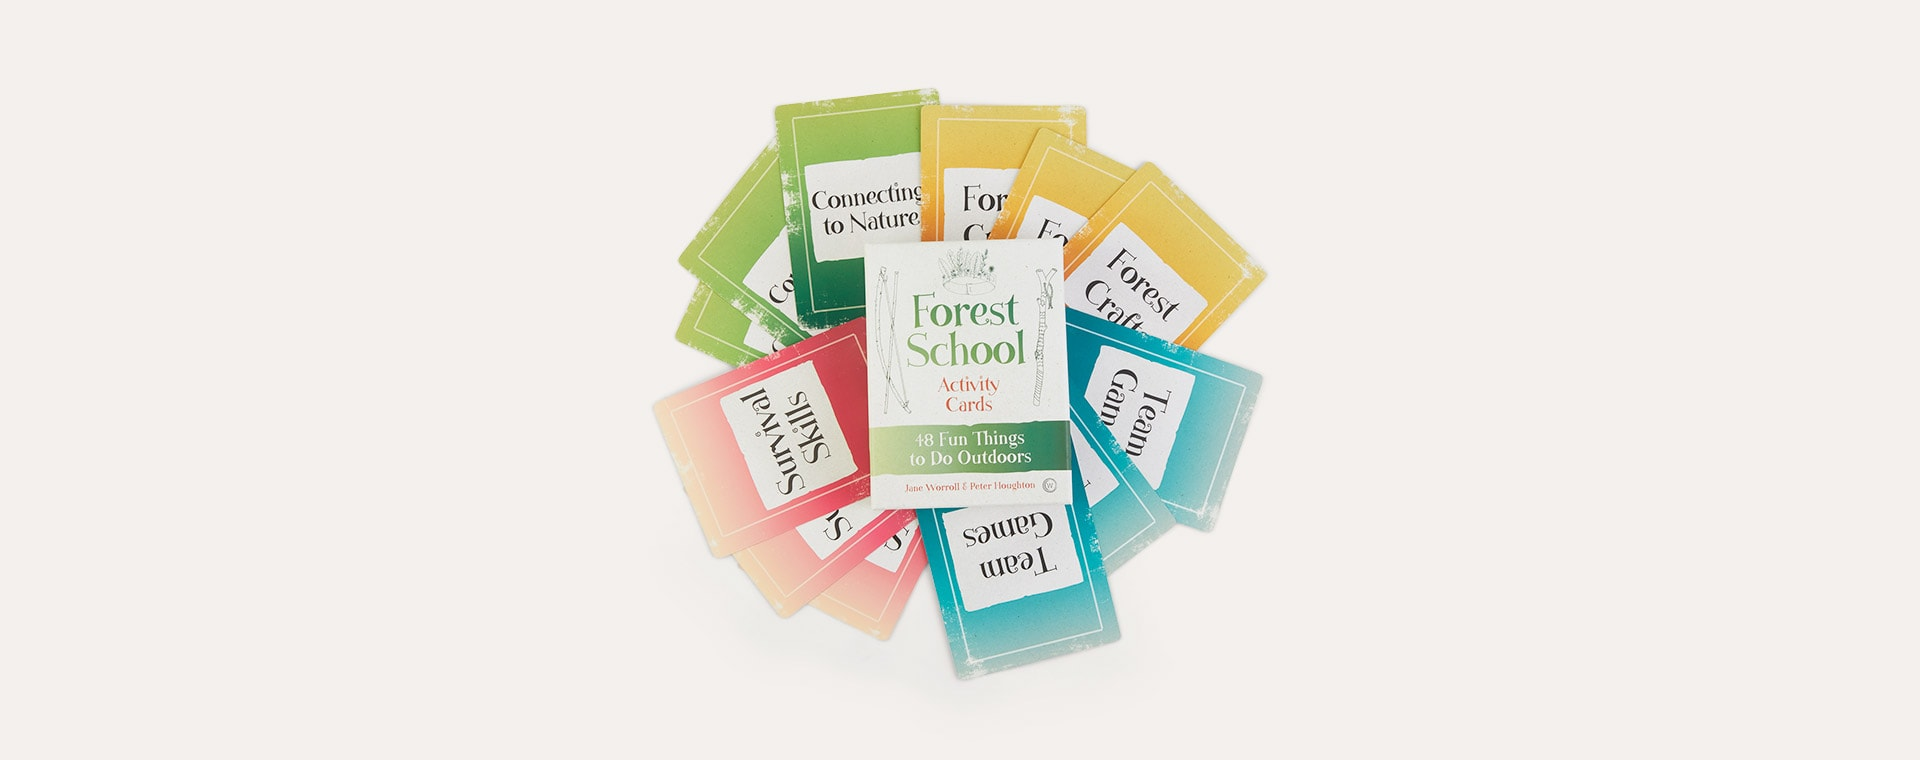 Multi bookspeed Forest School Activity Cards